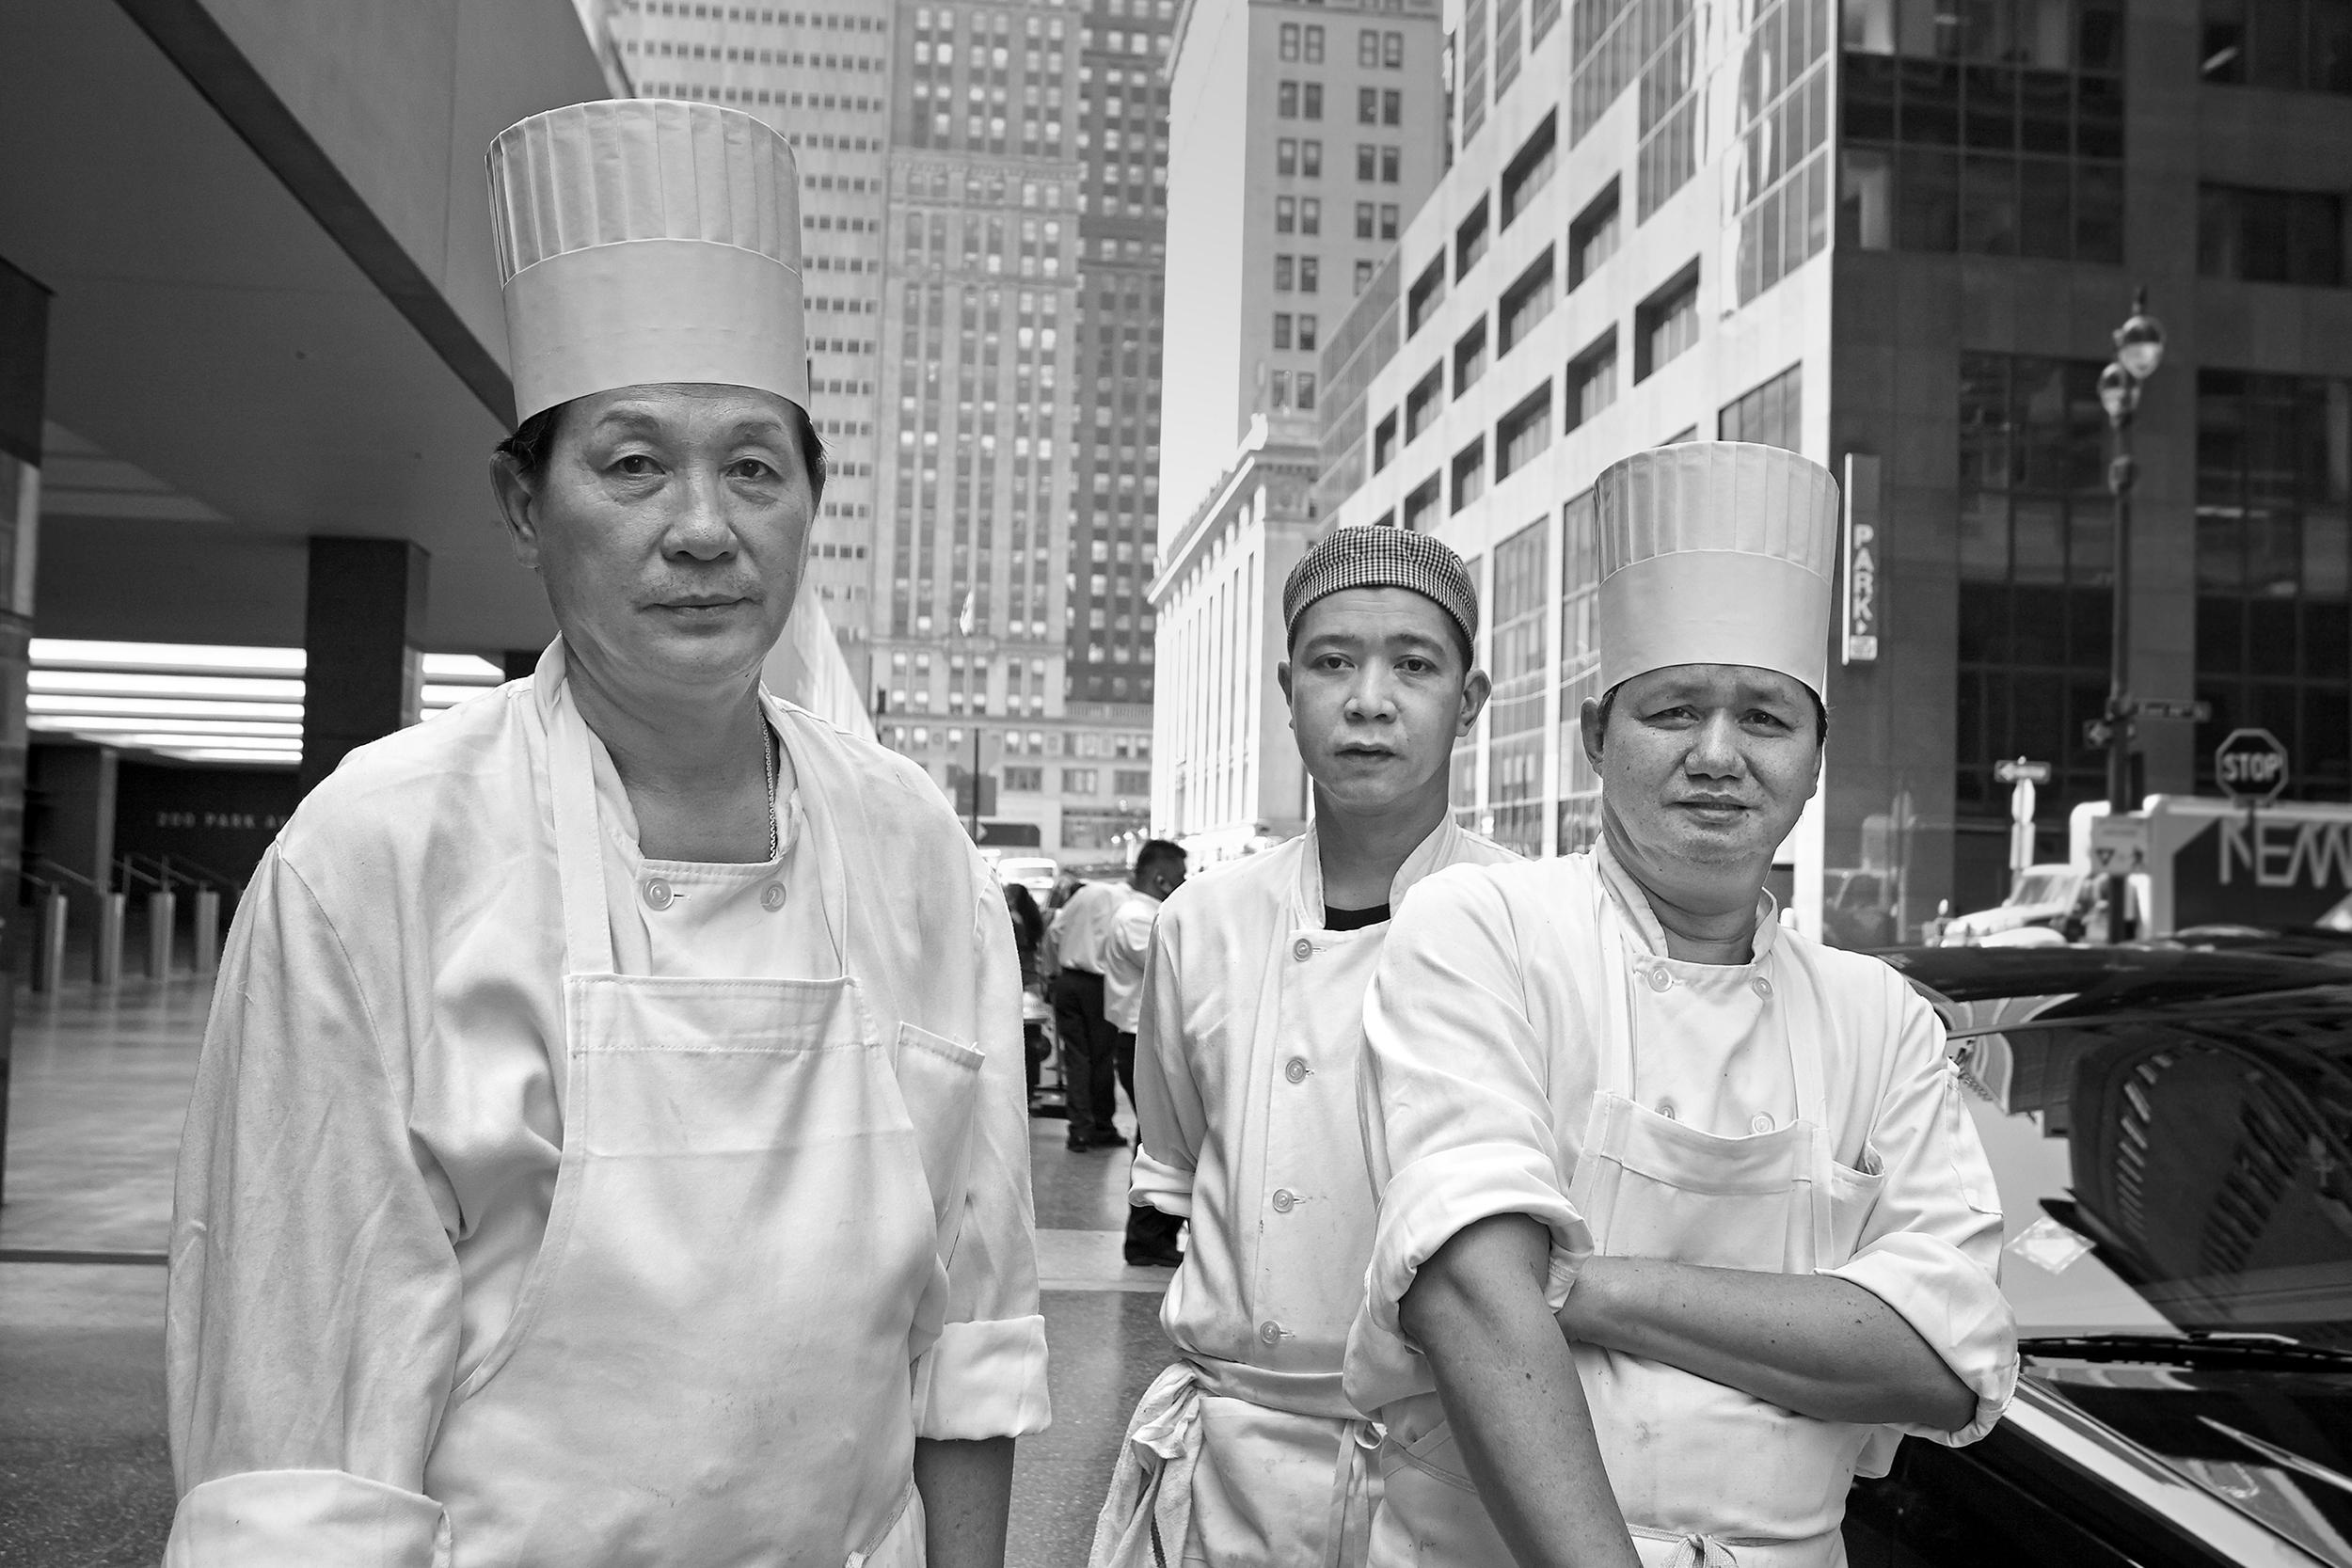 Chefs - New York